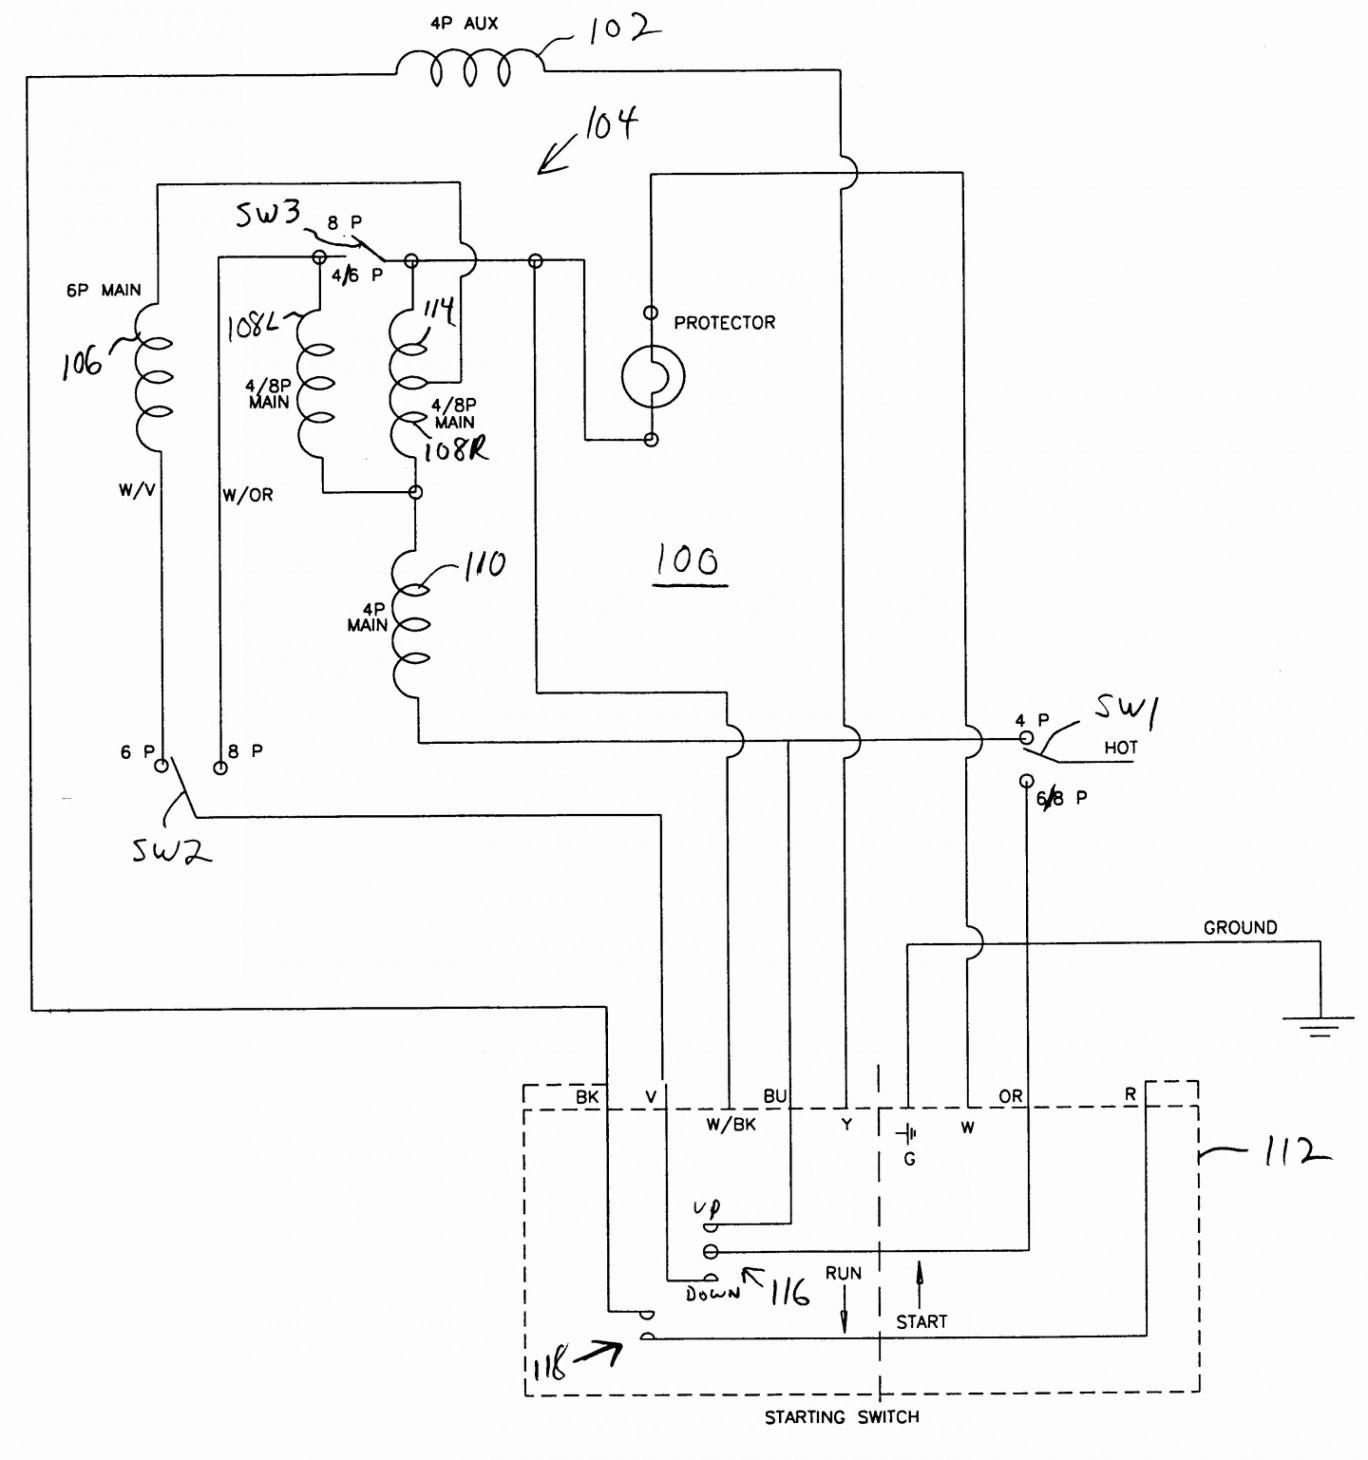 Century Ac Motor Wiring Diagram 115 230 Volts | Manual E-Books - Century Ac Motor Wiring Diagram 115 230 Volts